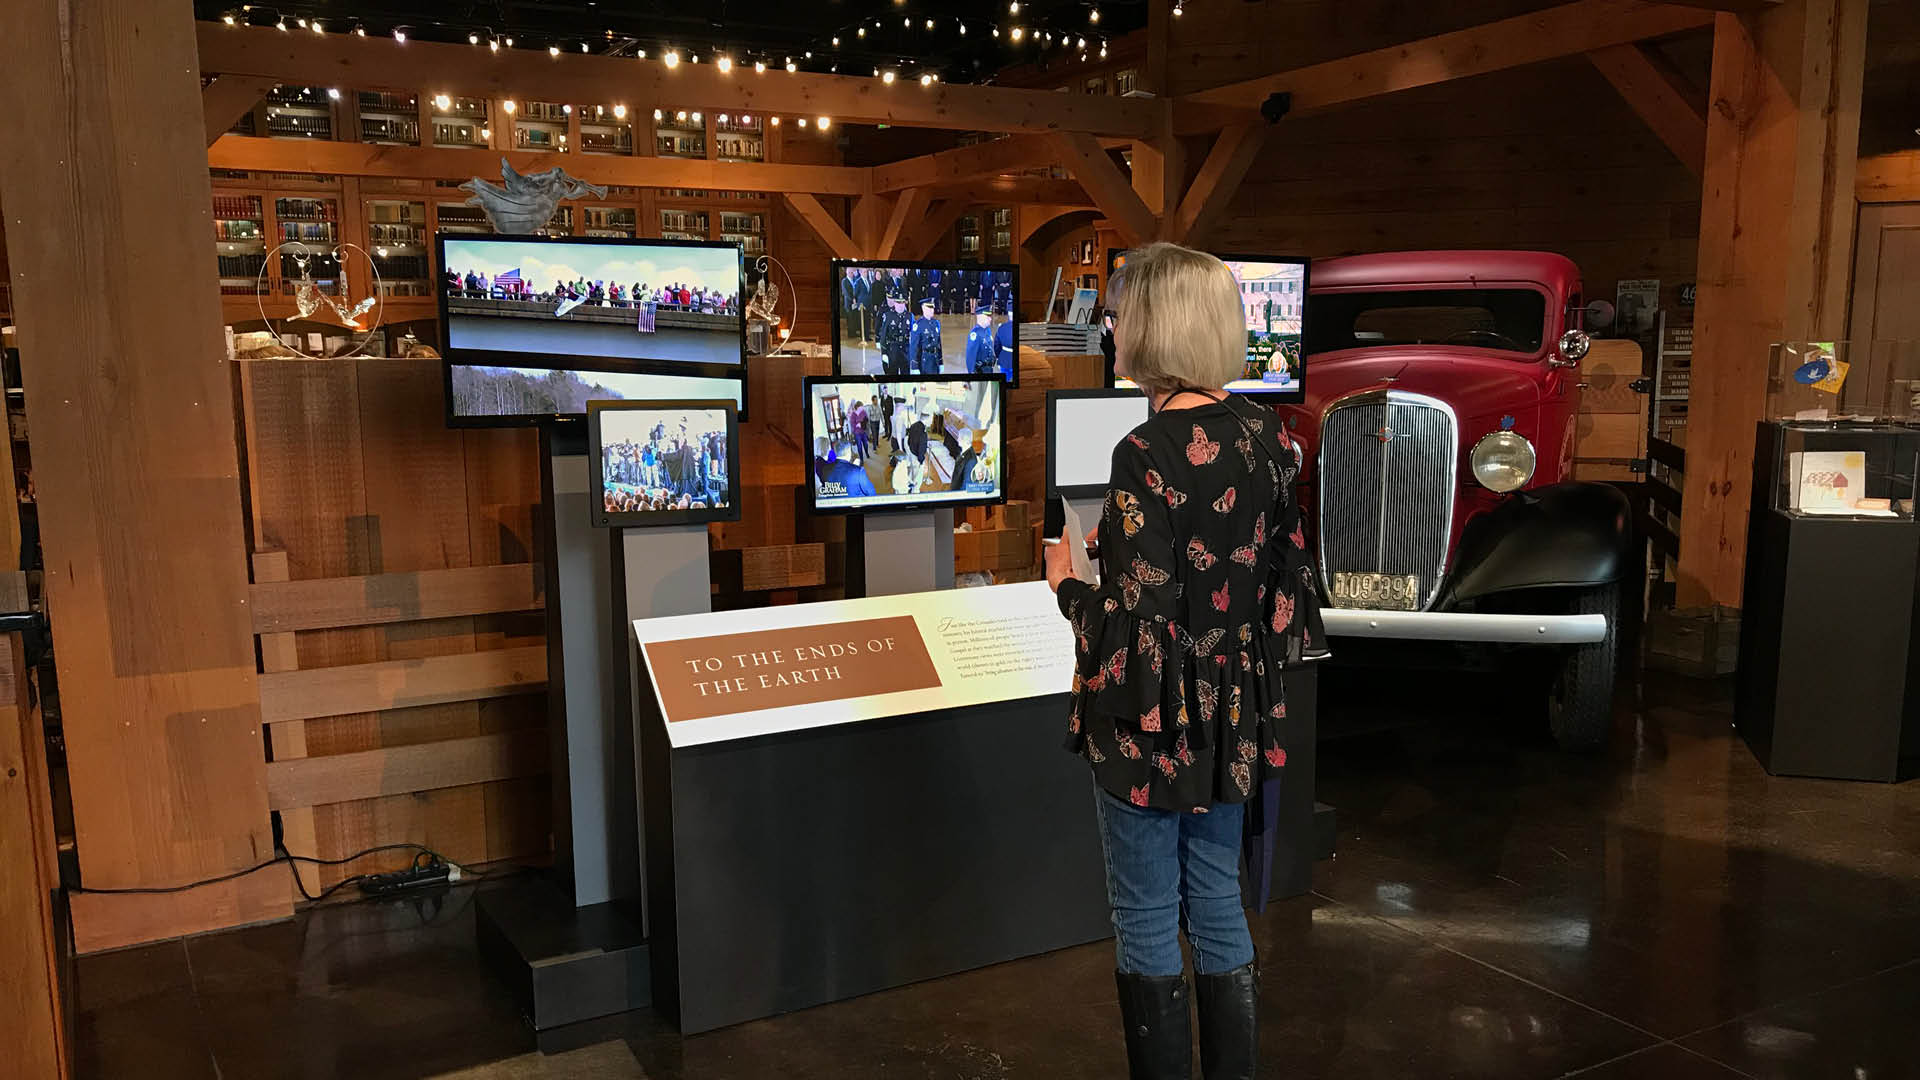 Billy Graham Memorial Exhibit Screens.jpg